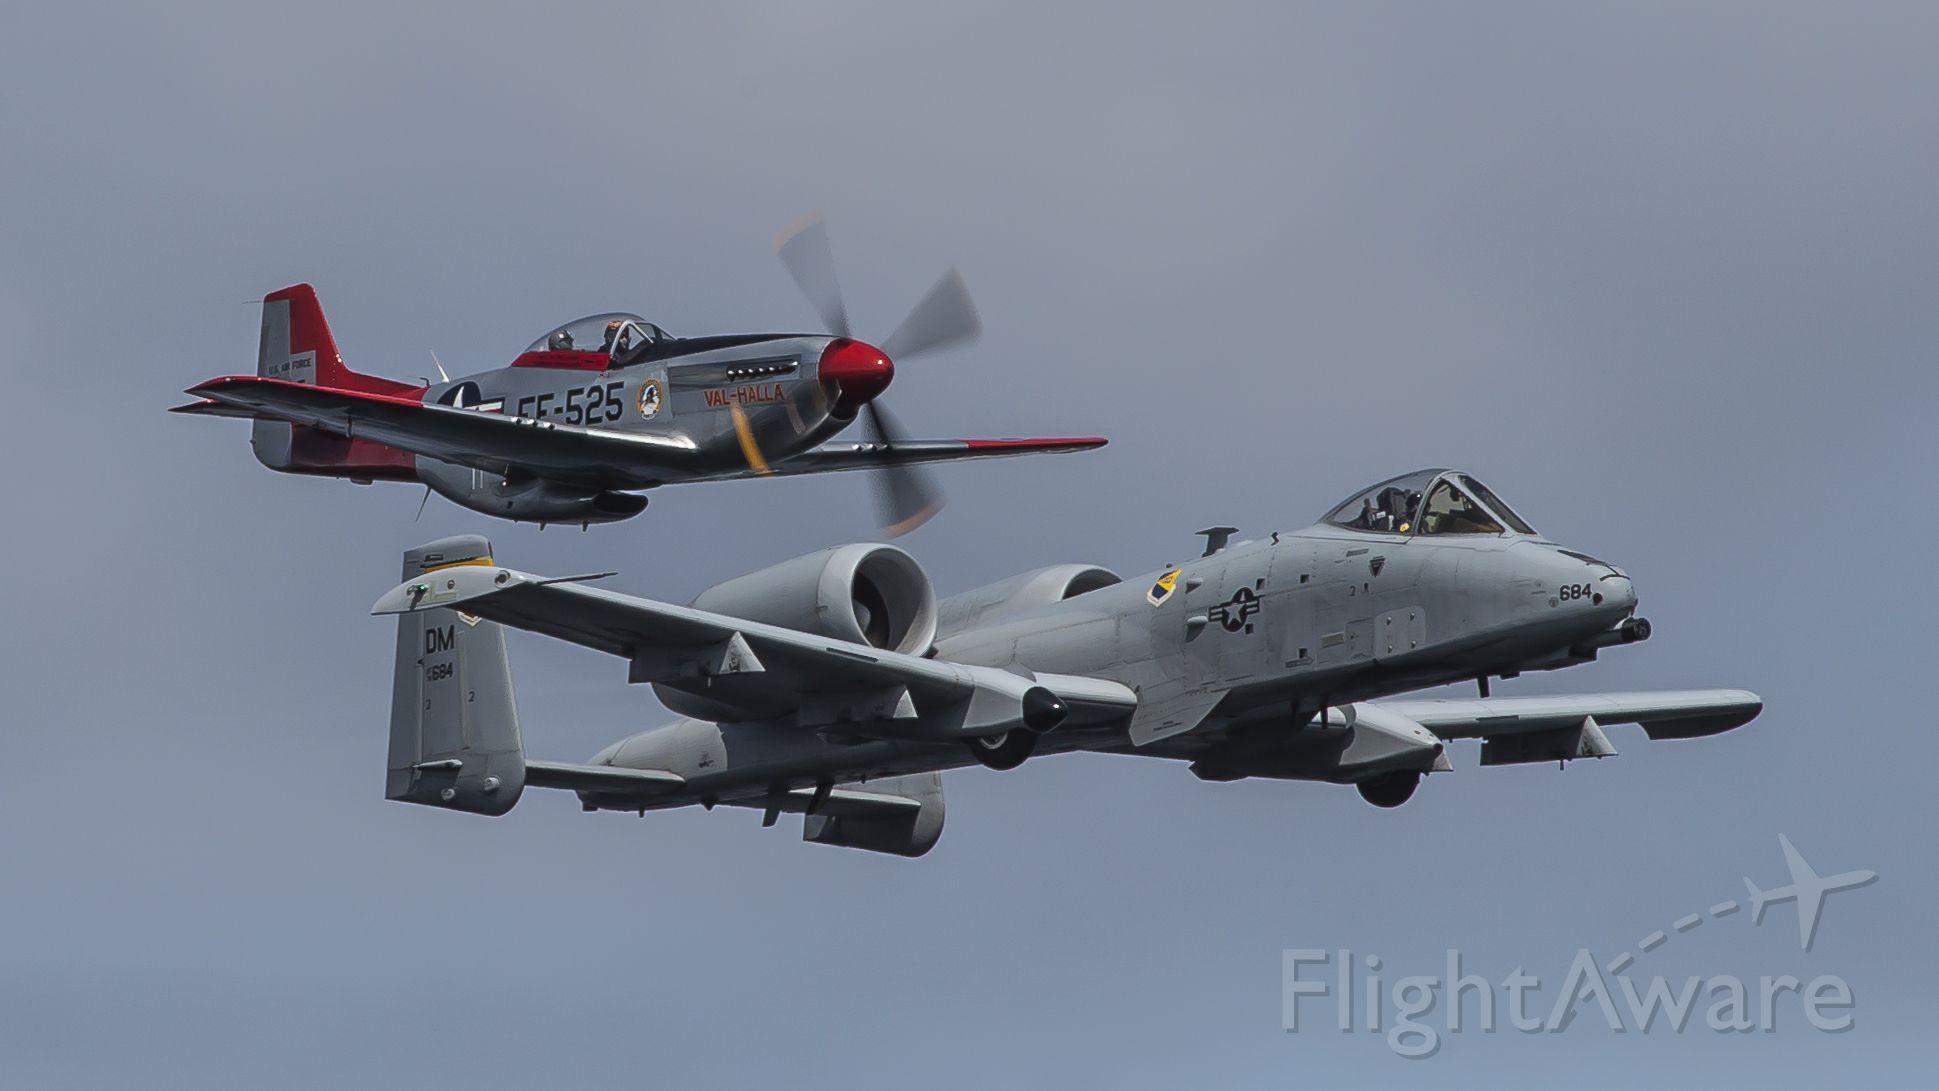 Fairchild-Republic Thunderbolt 2 — - A-10 Warthog & P-51D Mustangbr /Seafair 8-3-2018